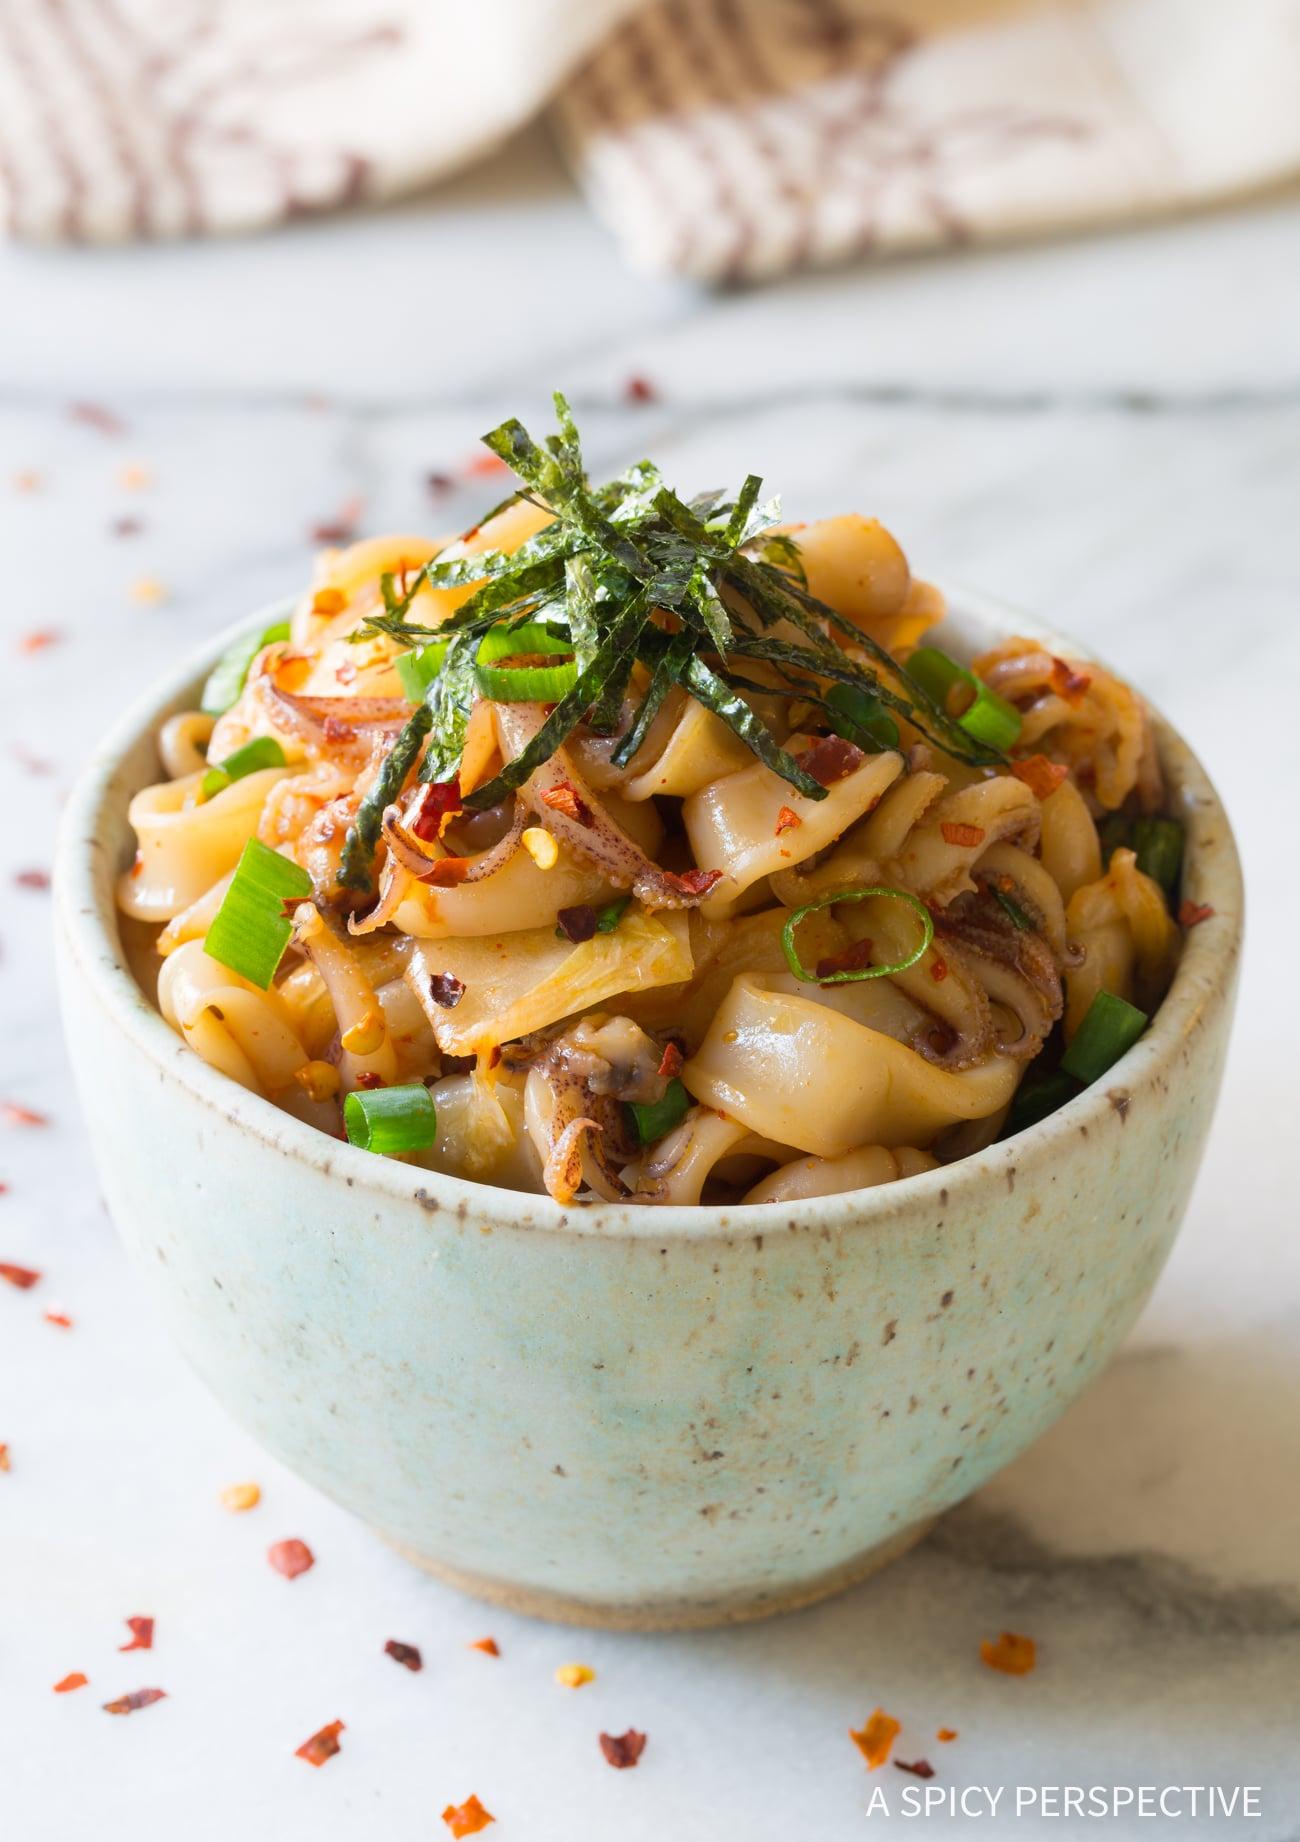 Simple Hawaiian Tako Poke Recipe (Octopus or Squid!)